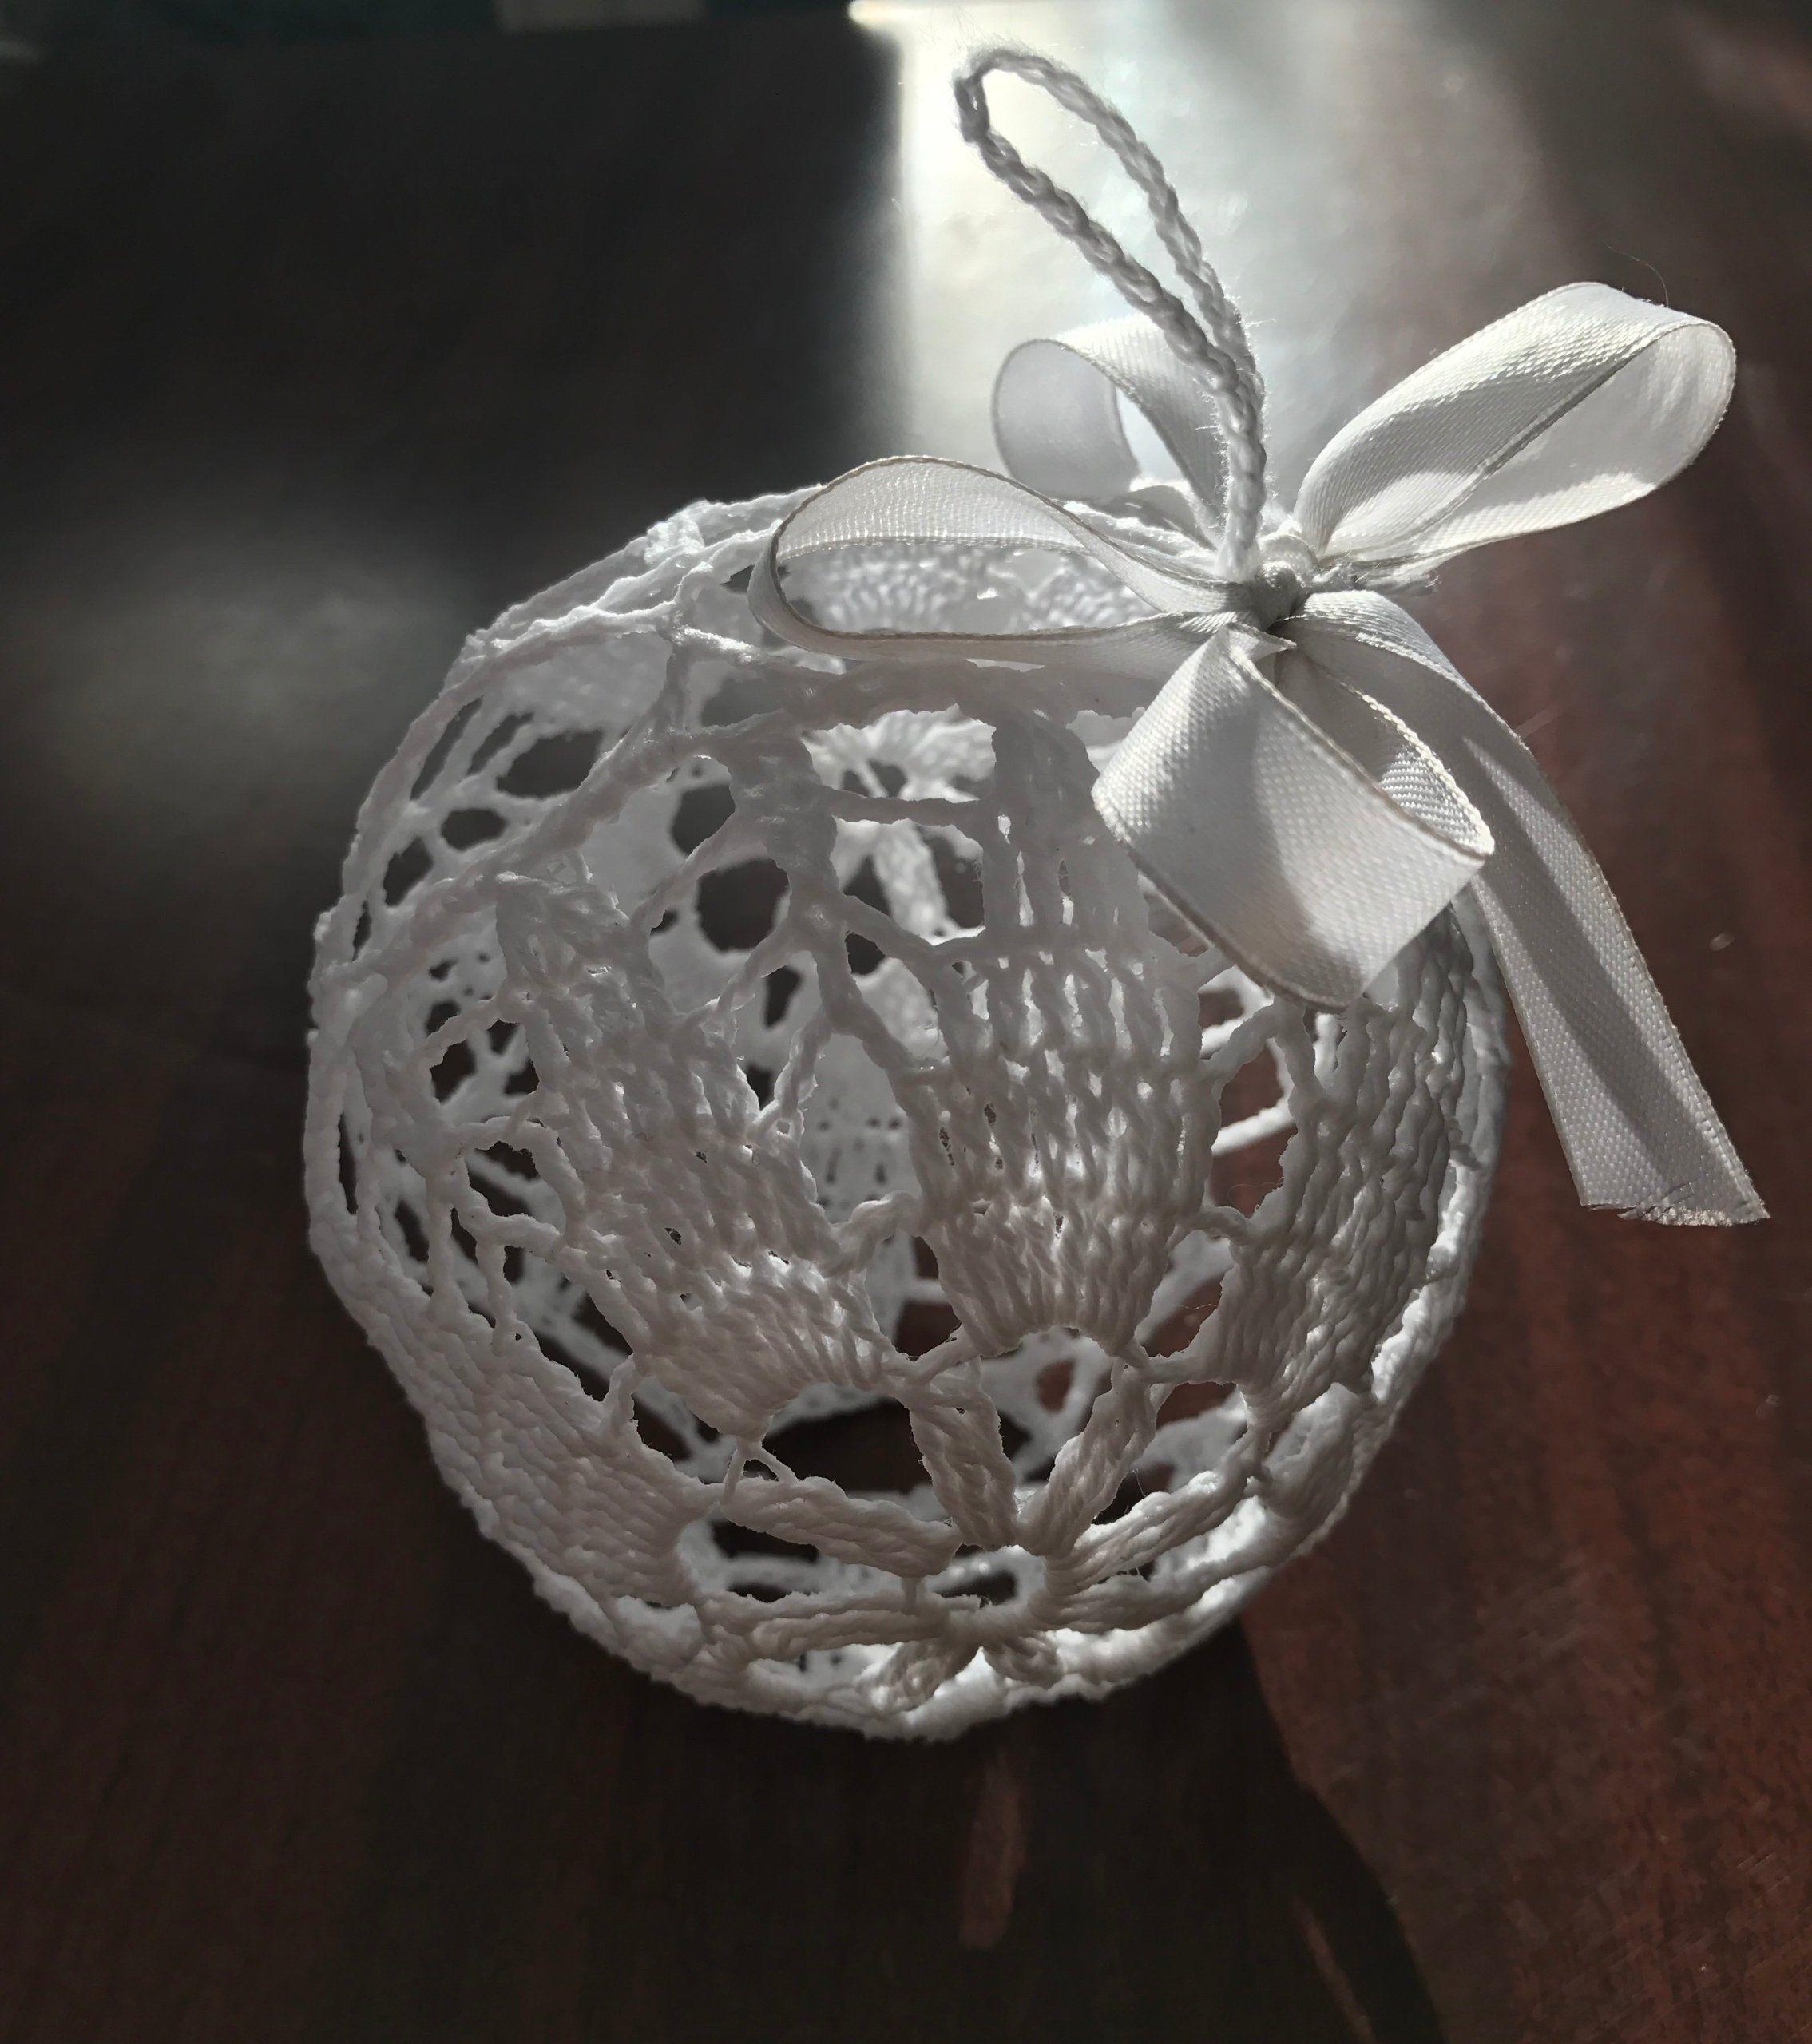 Bombki Choinkowe Na Szydelku Biale 6635528313 Oficjalne Archiwum Allegro Christmas Bulbs Holiday Decor Christmas Ornaments